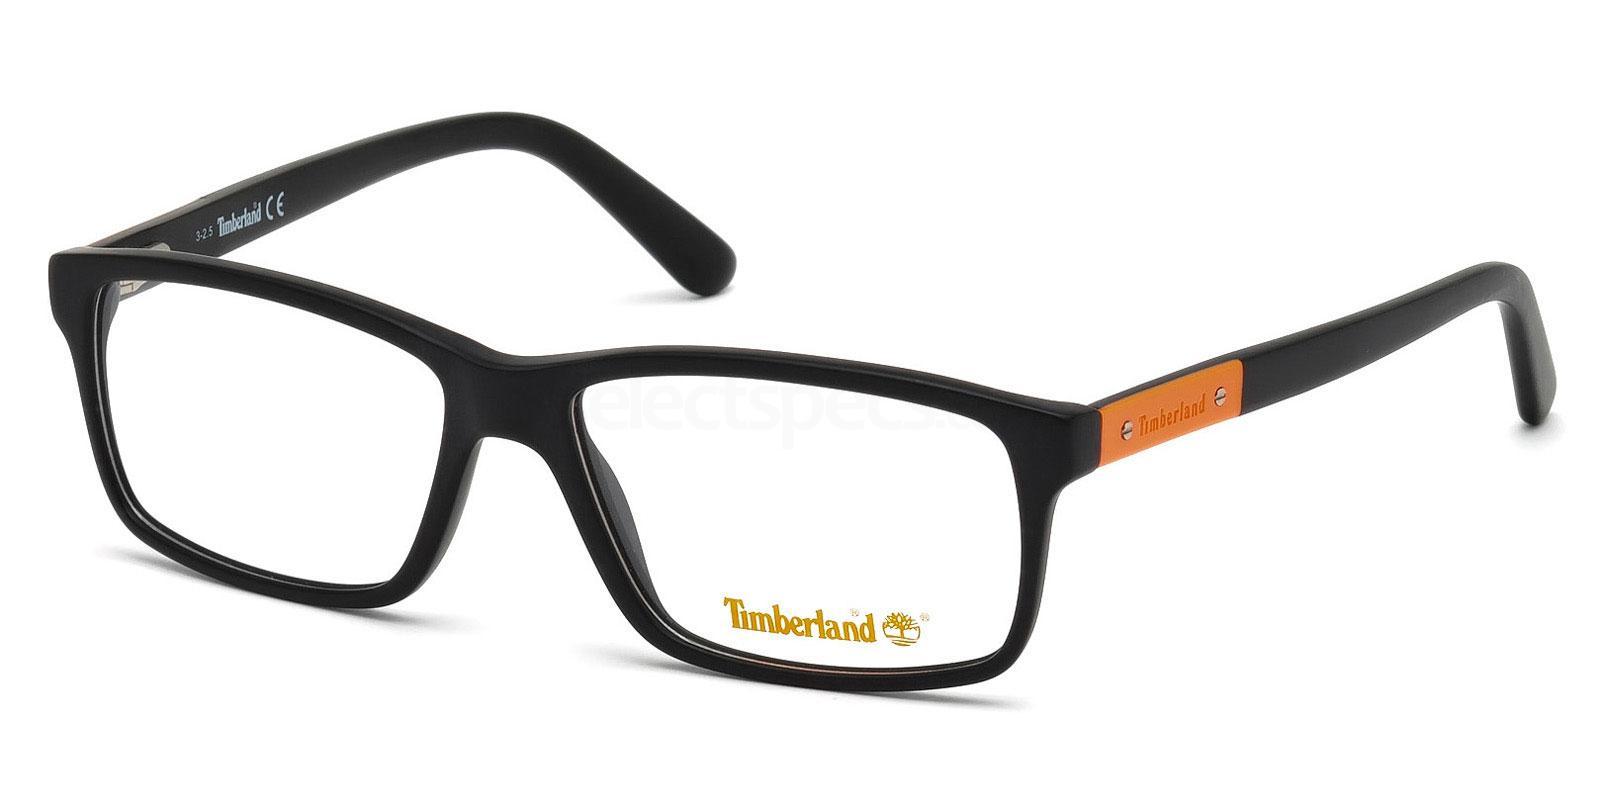 002 TB1362 Glasses, Timberland